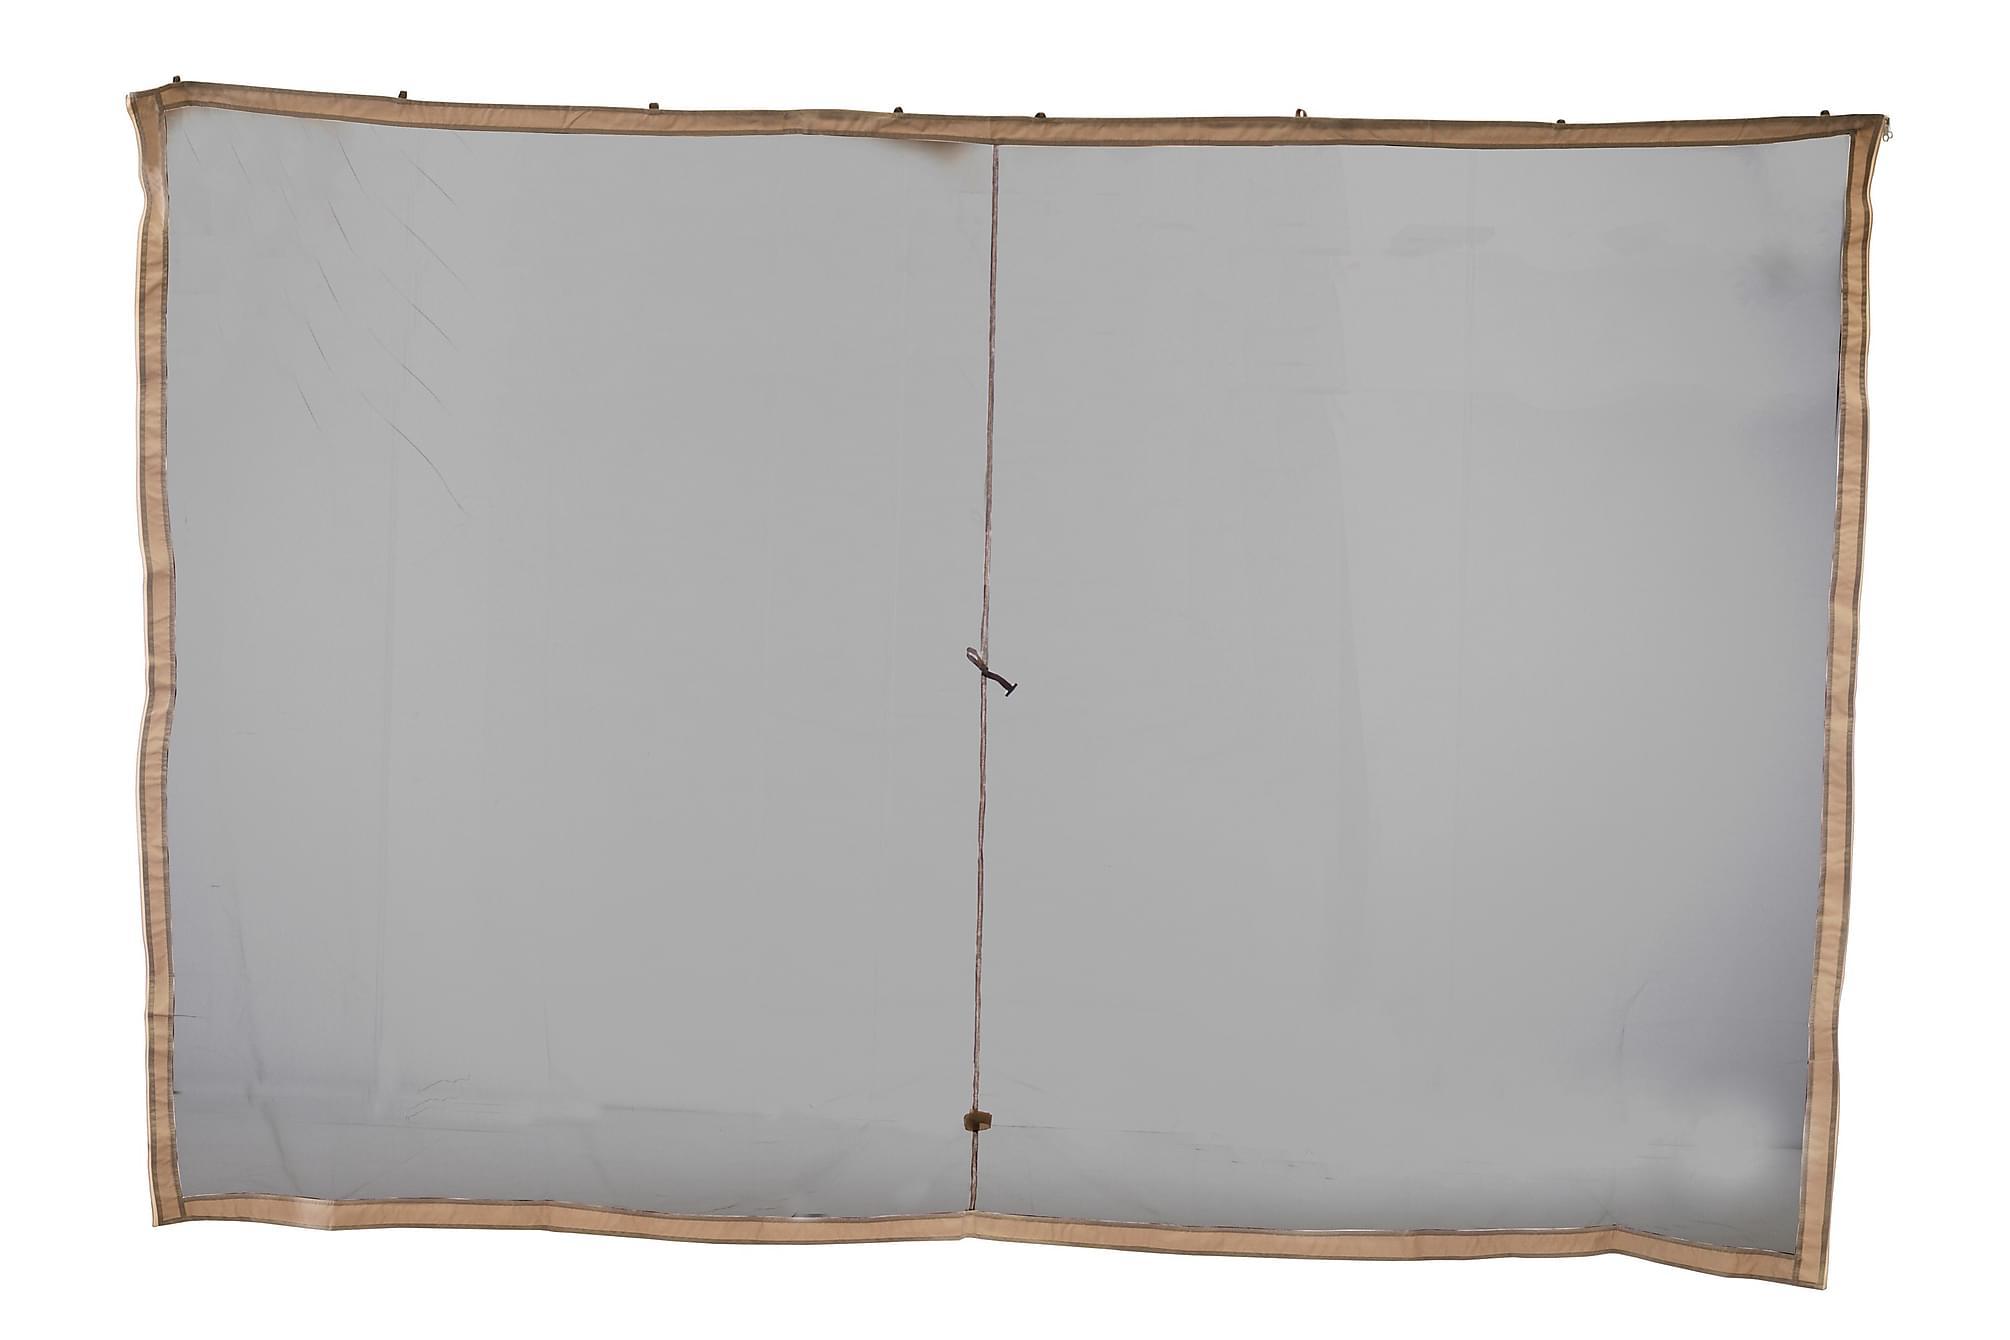 GALA Myggnät 300×400 Beige